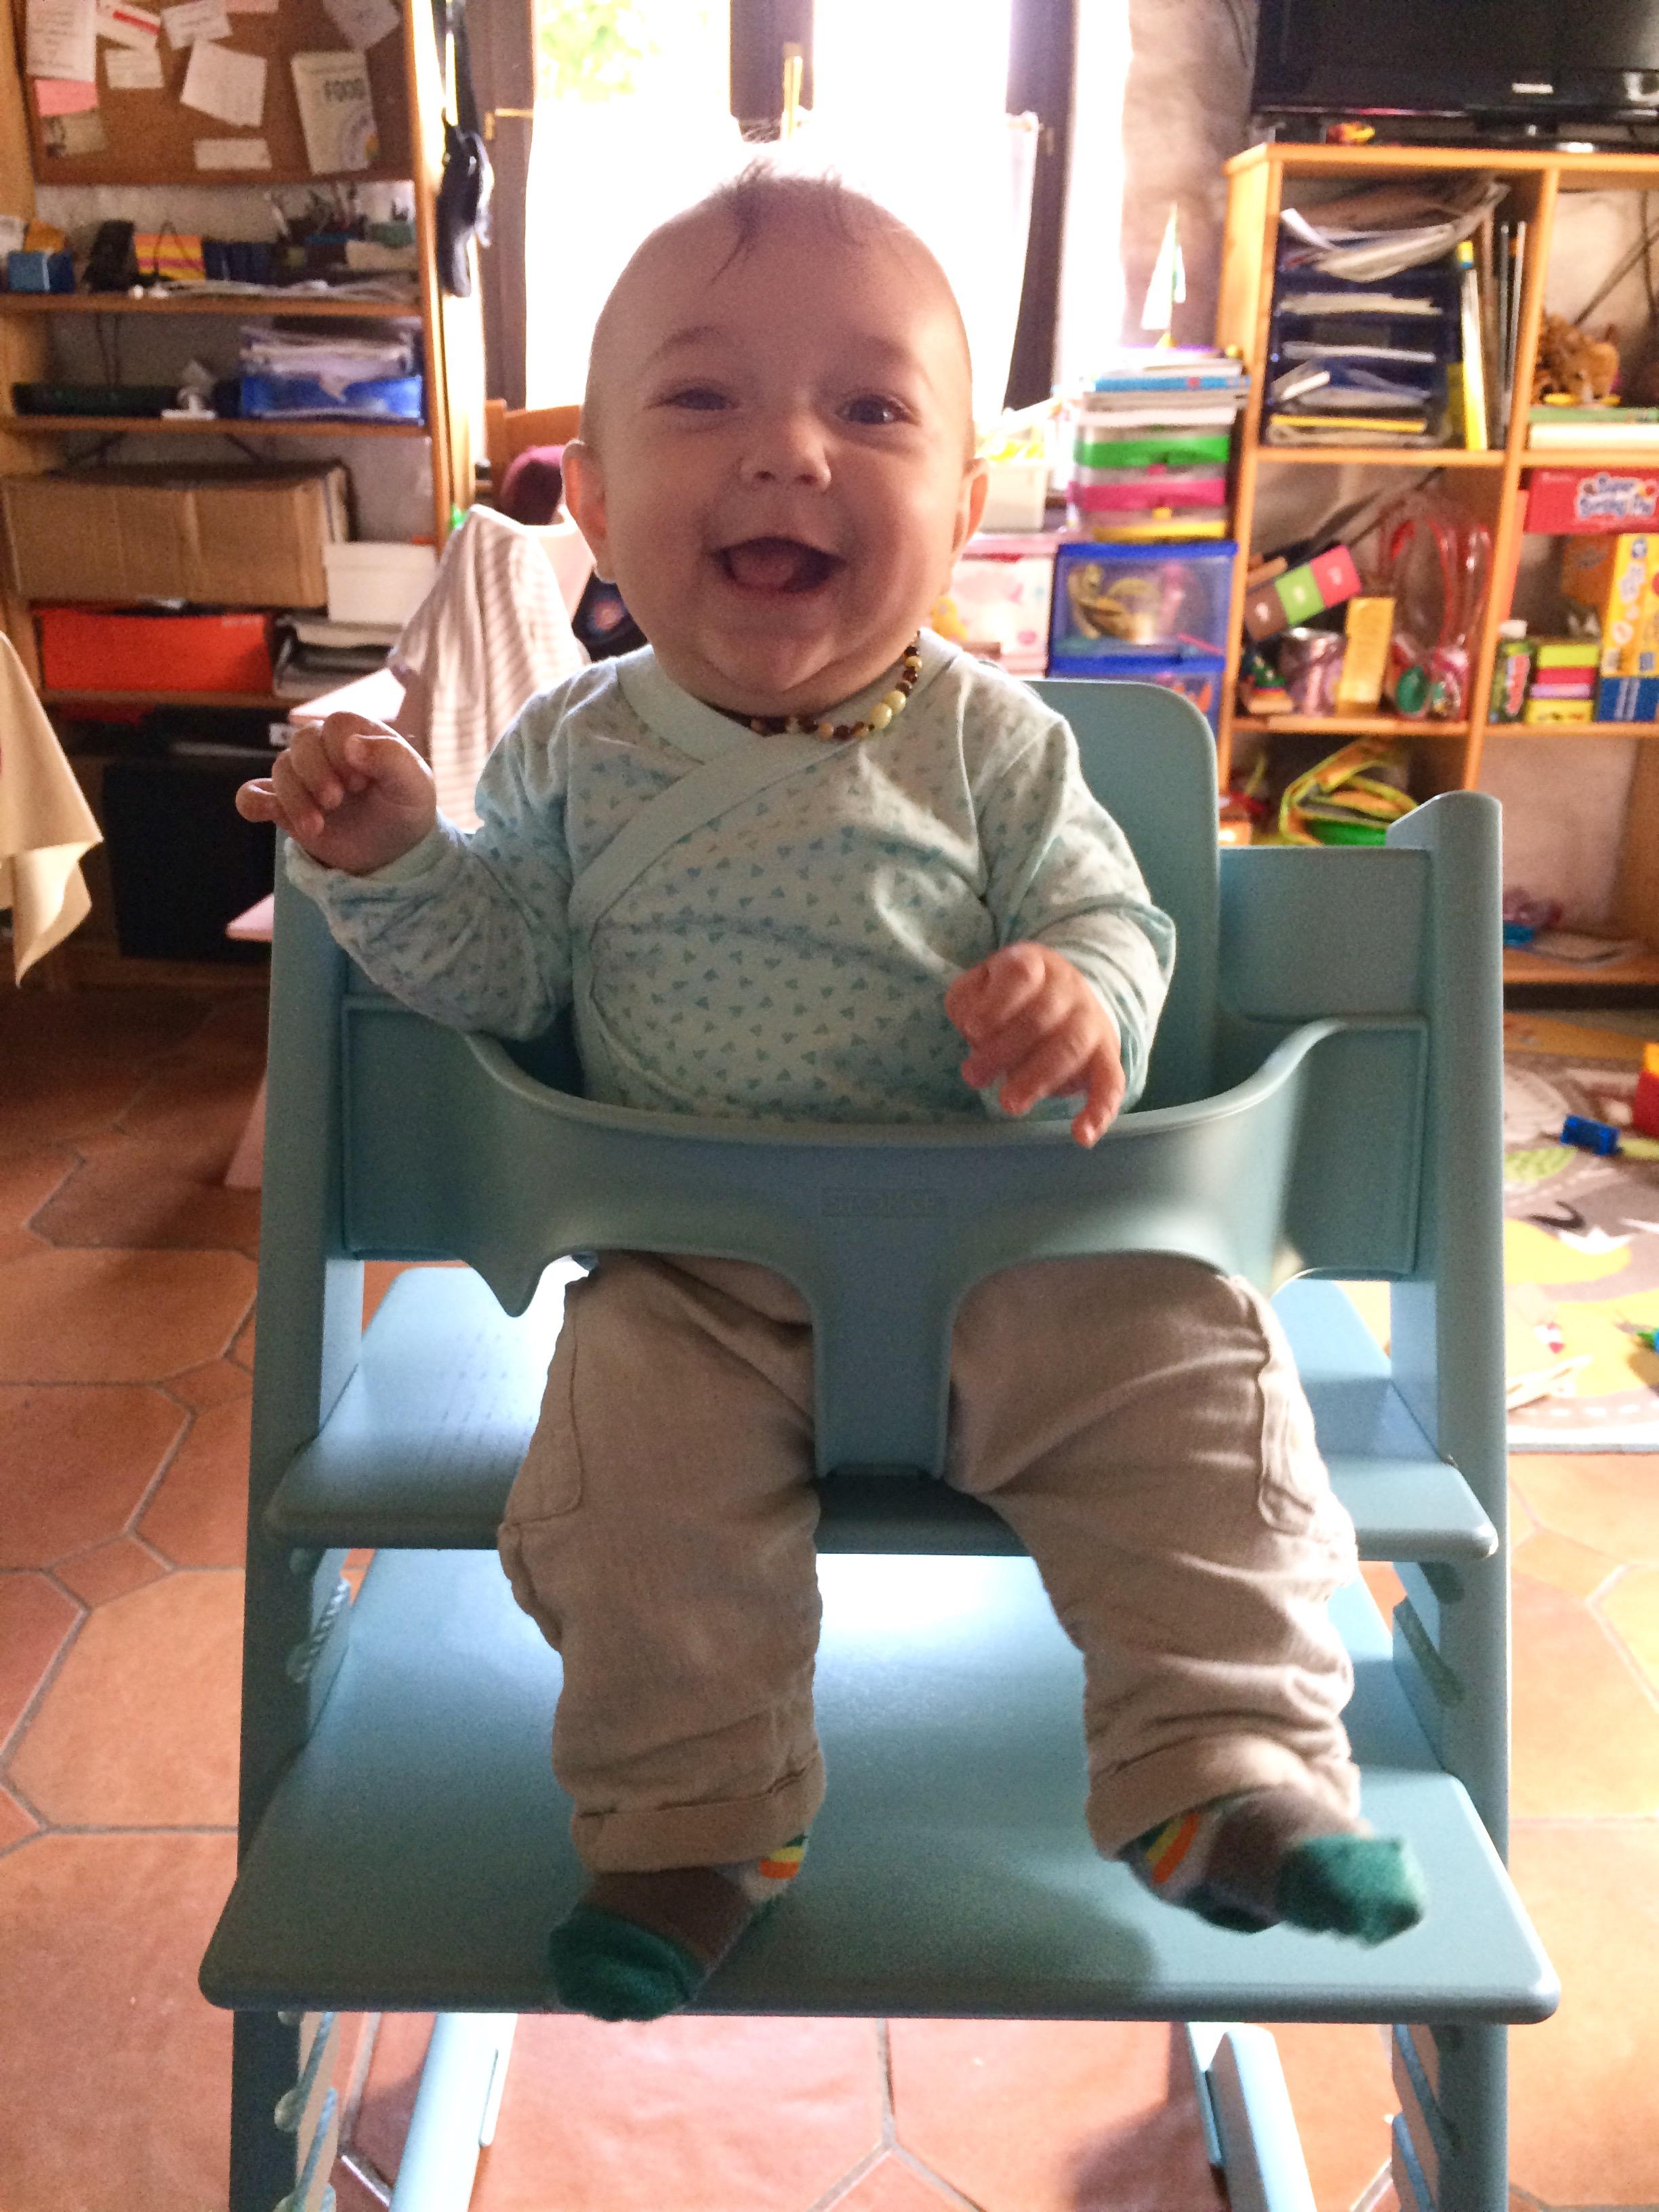 tripp-trapp-stokke-bébé-garçon-bleu-5-mois